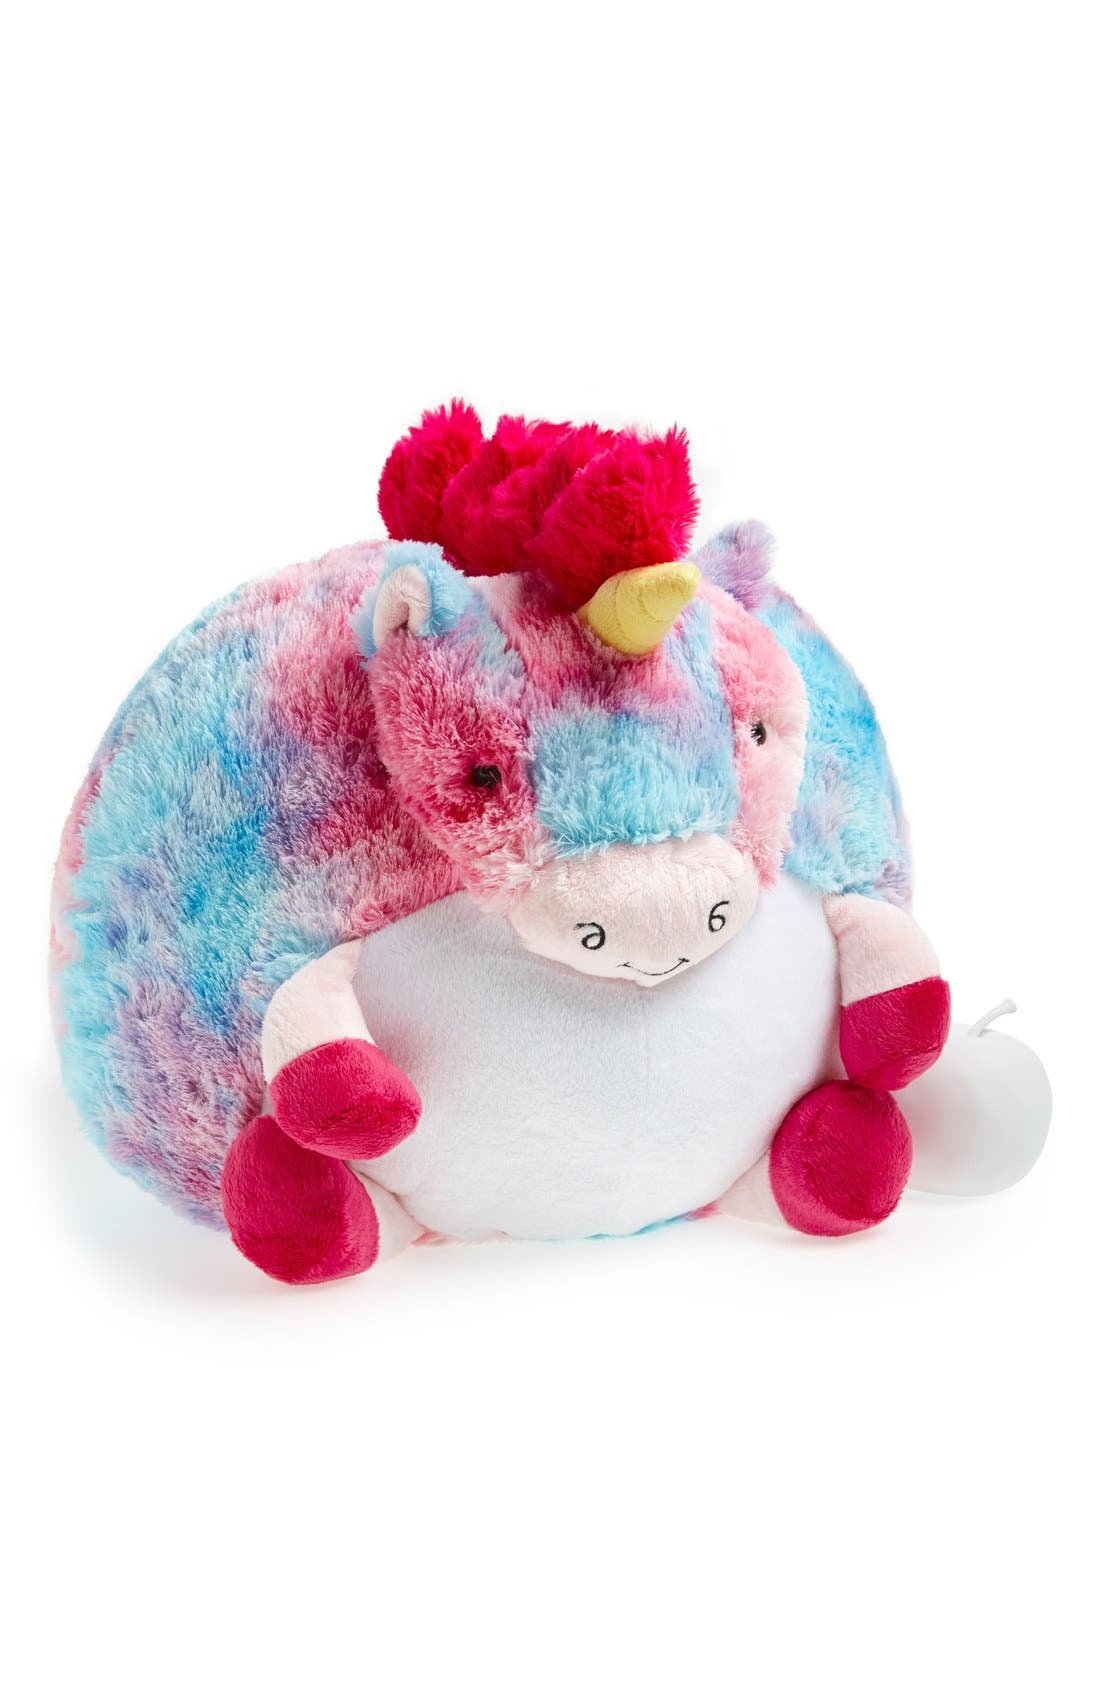 Alternate Image 1 Selected - Squishable 'Unicorn - Prism' Plush Stuffed Animal